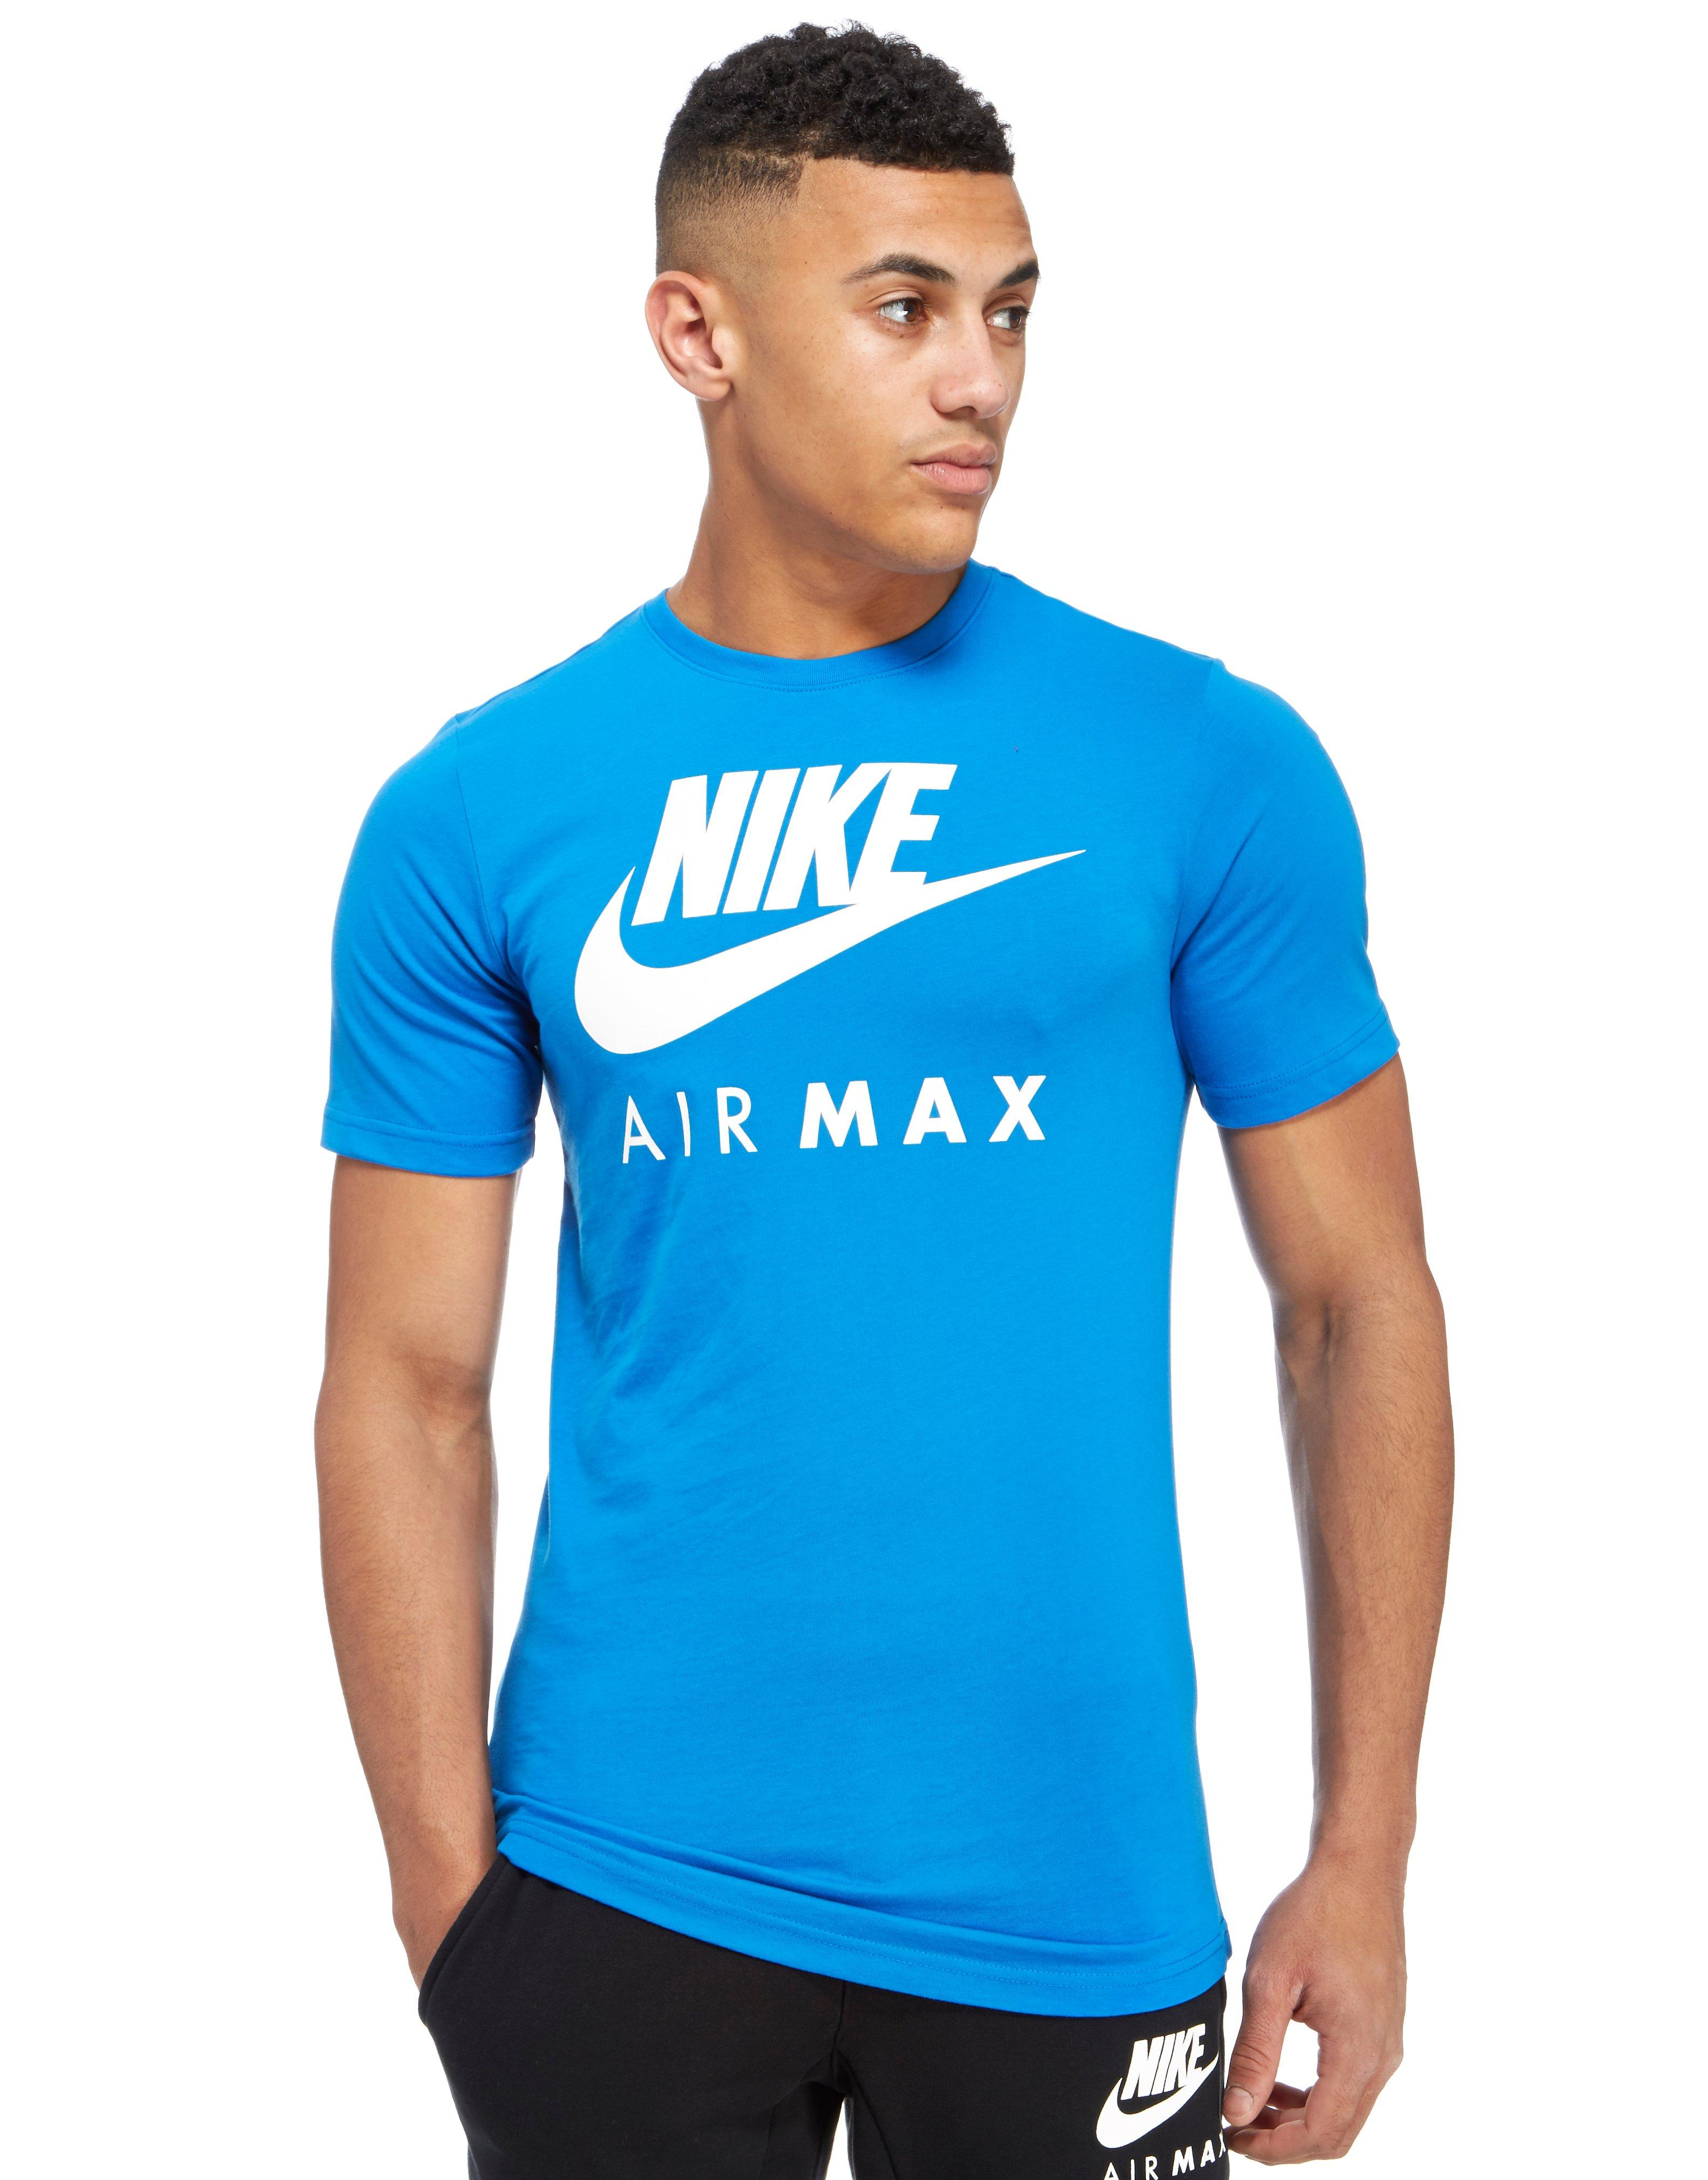 Air Max Vêtements Egypte